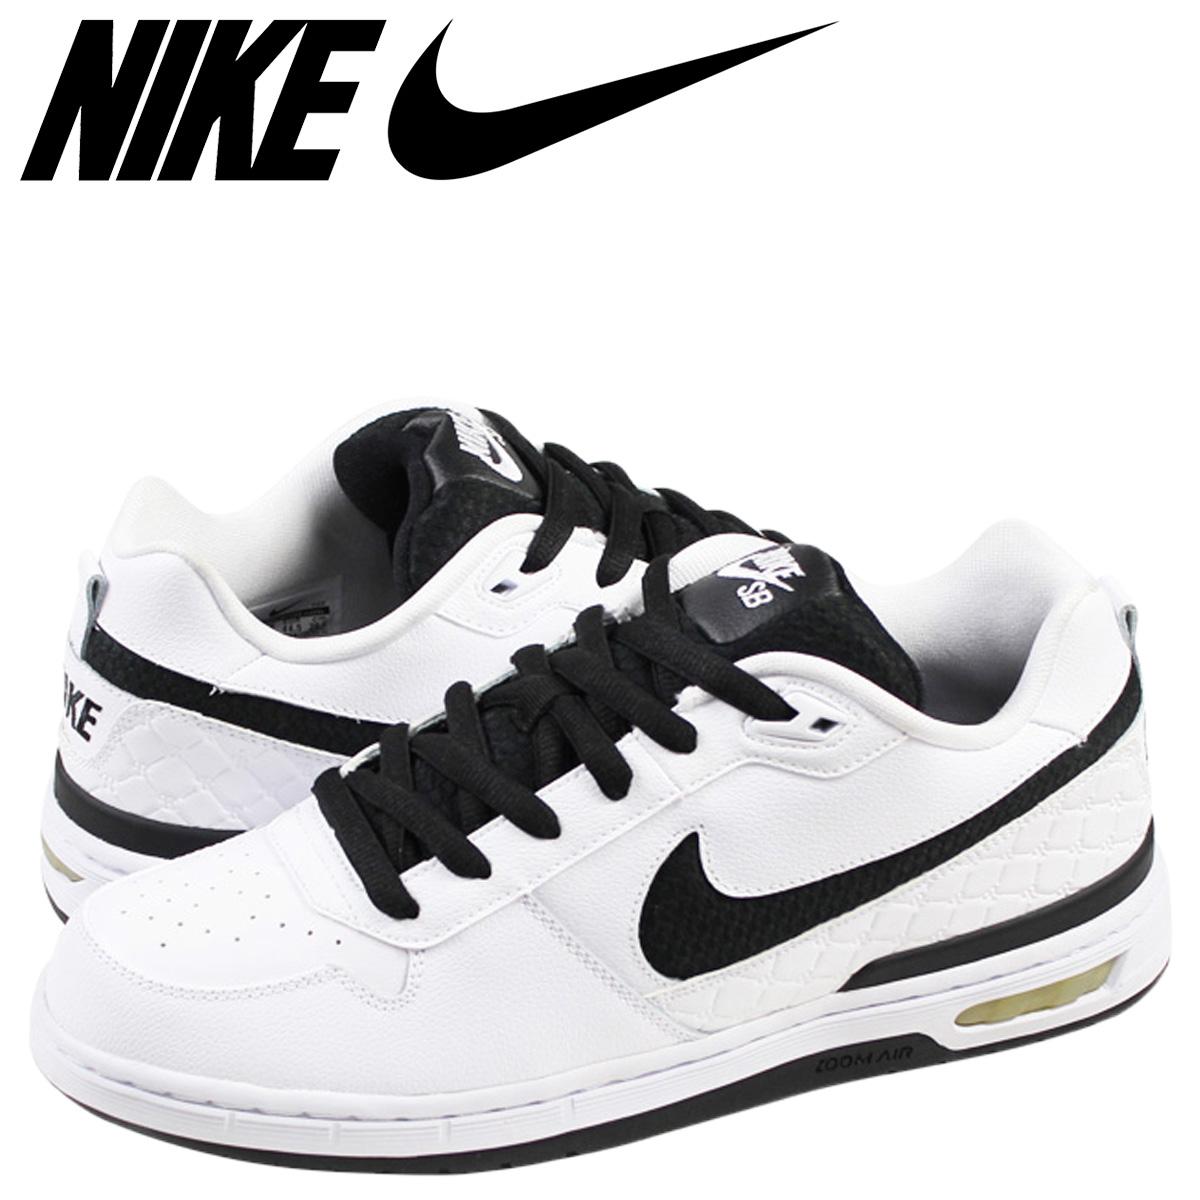 Nike NIKE sneakers SB PAUL RODRIGUEZ ZOOM AIR LOW SB Paul Rodriguez zoom  air low 310802-100 white men